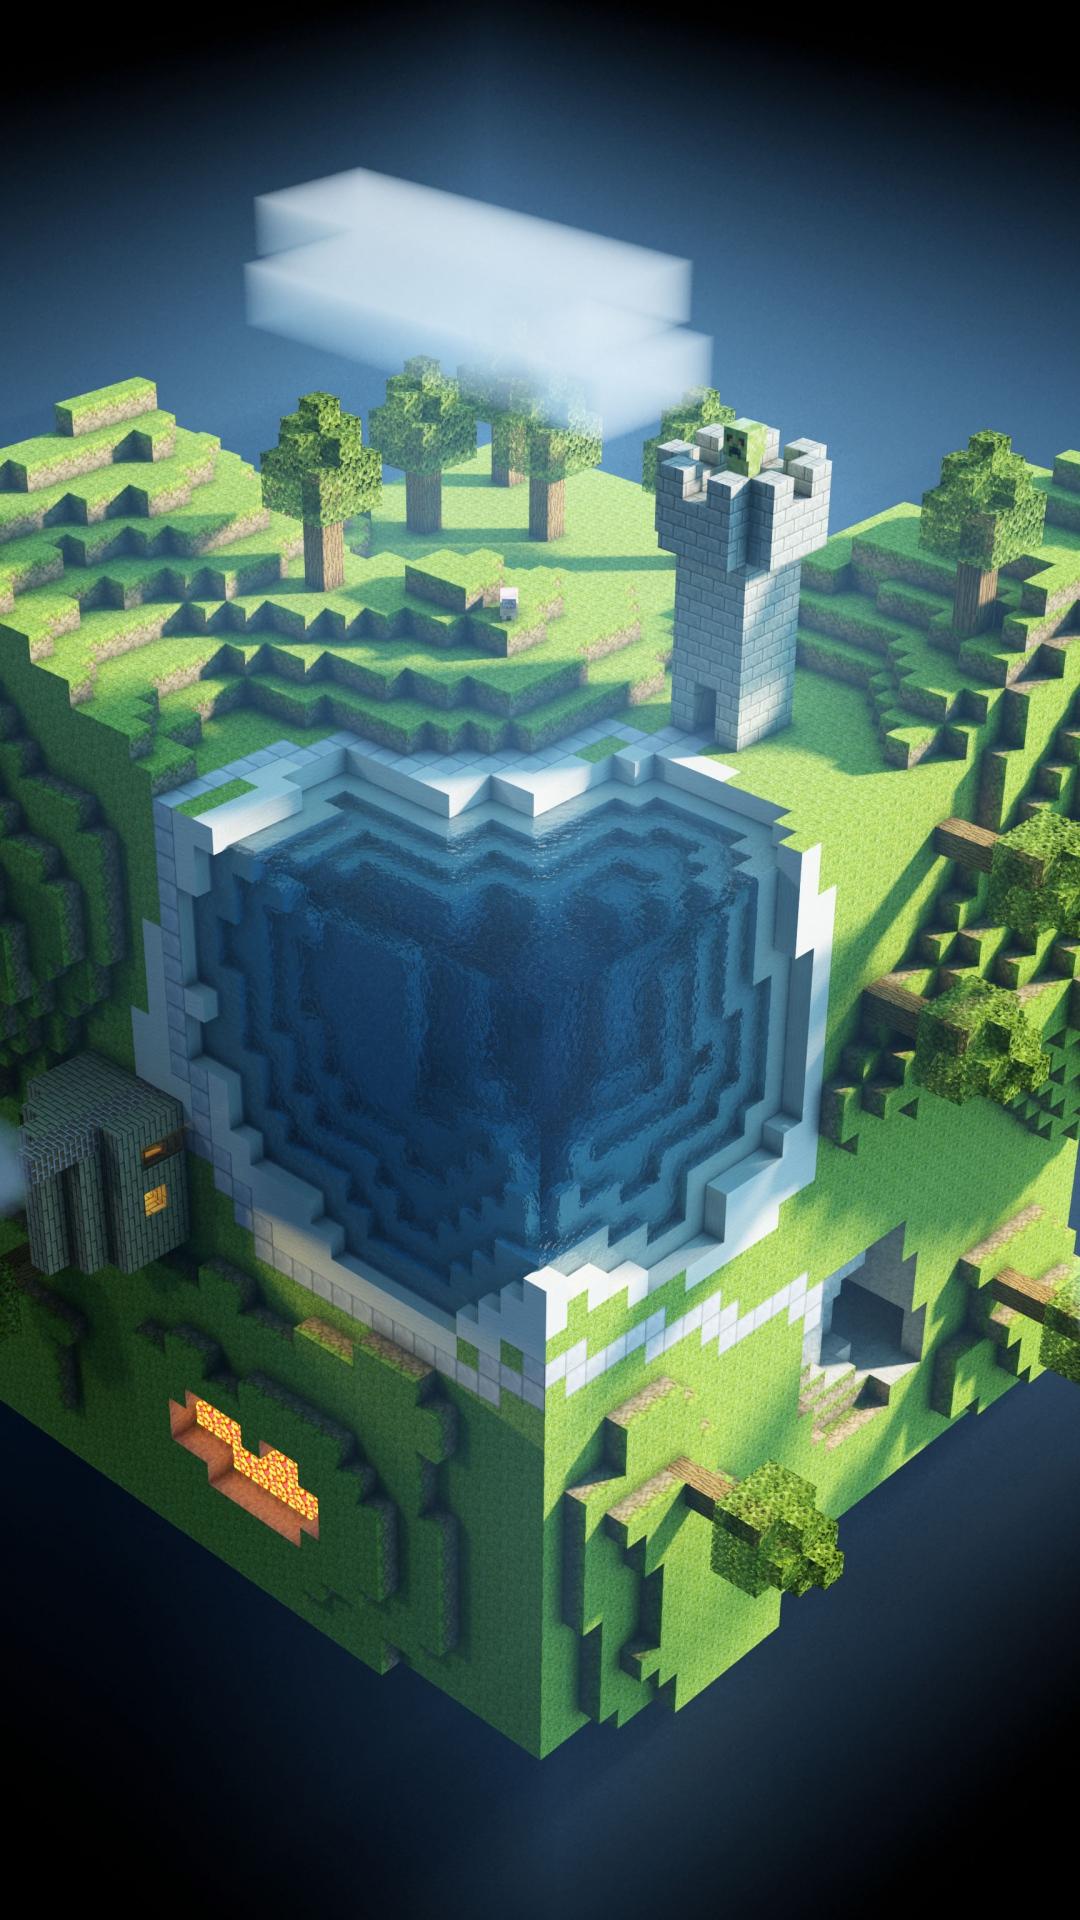 49 Minecraft Hd Phone Wallpapers On Wallpapersafari